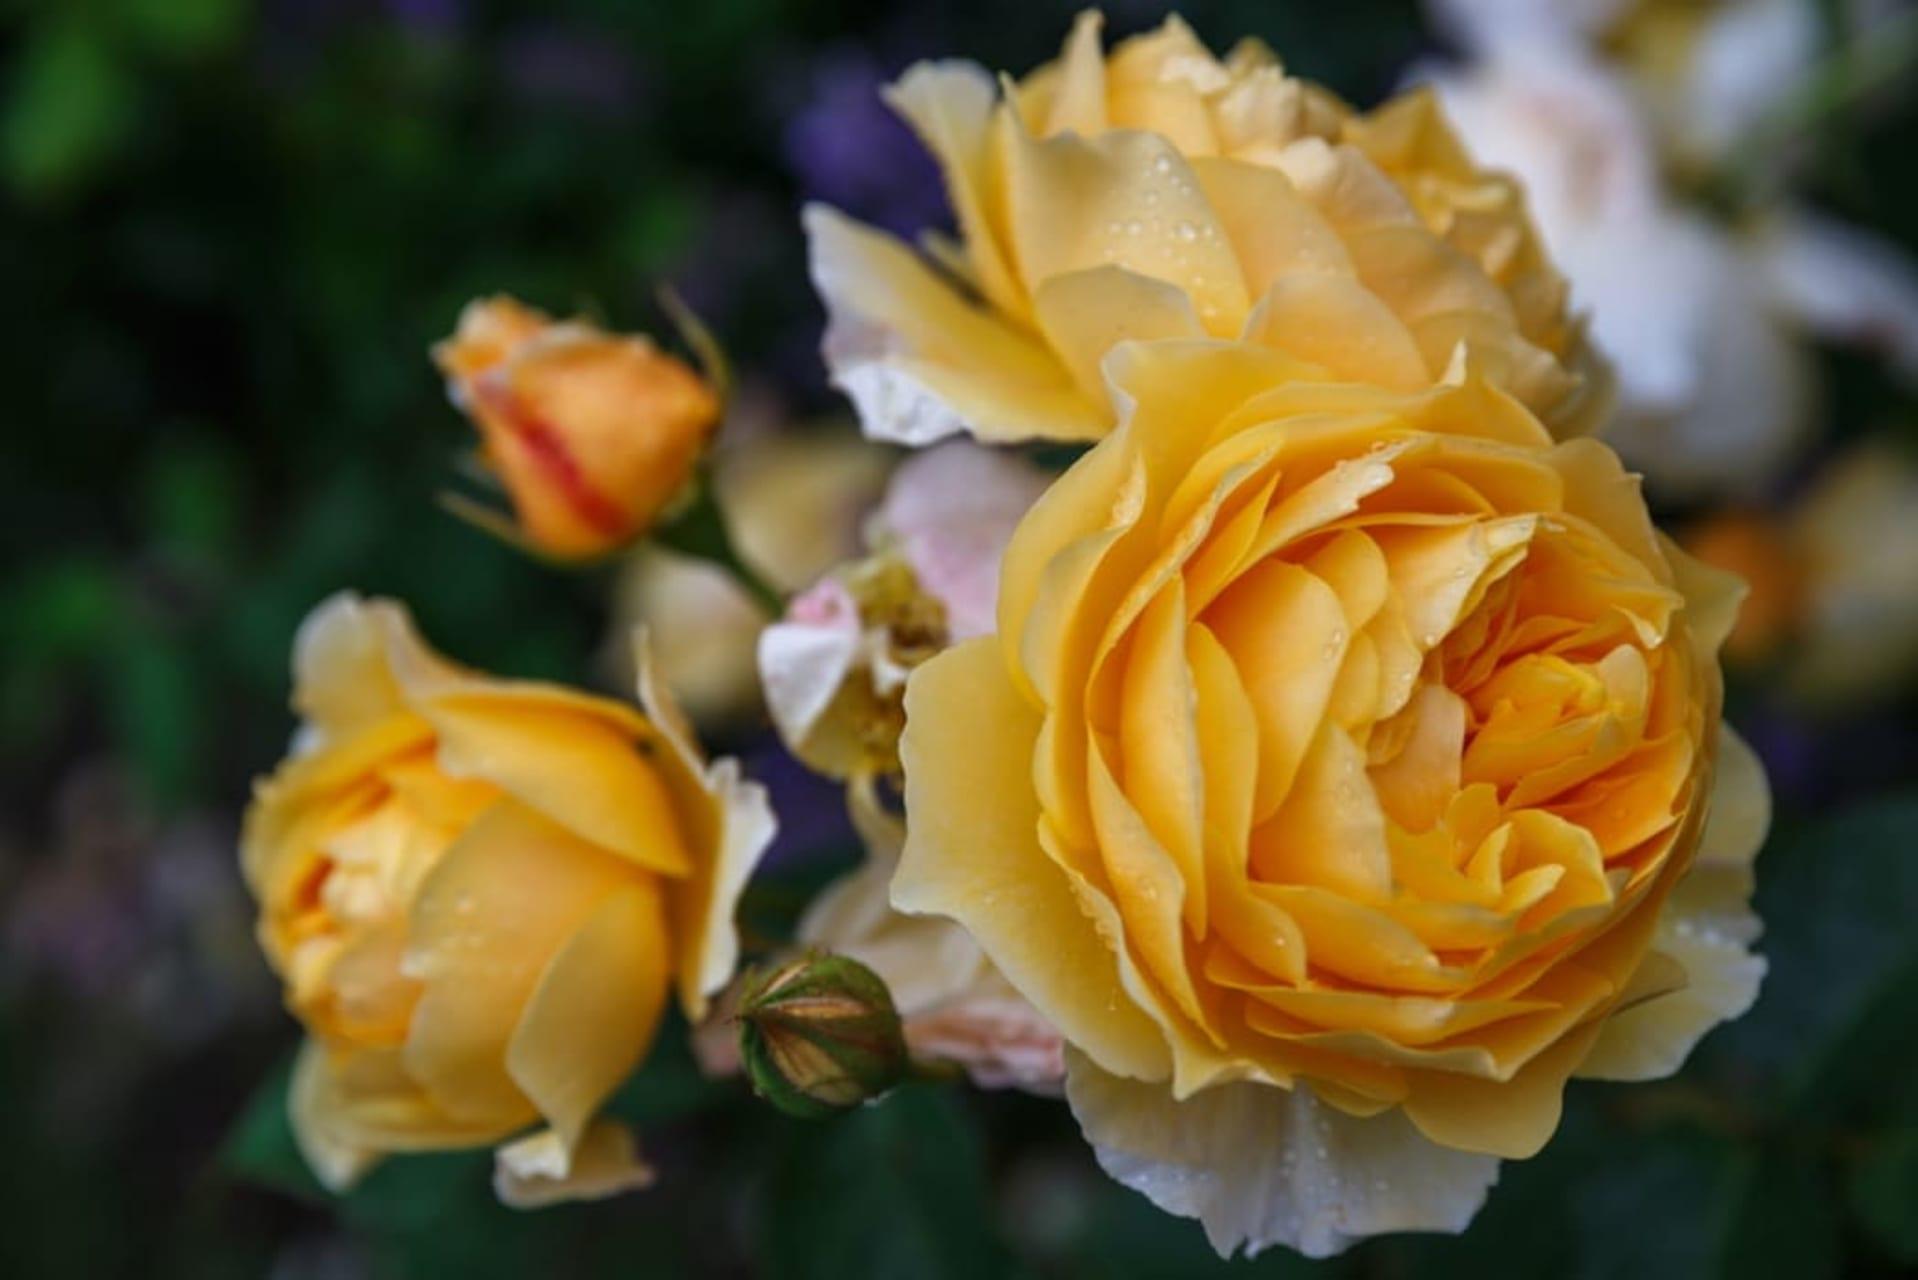 Assisi - Quand Fleuriront les Roses - La Roseraie David Austin à Assise (TOUR IN FRENCH)